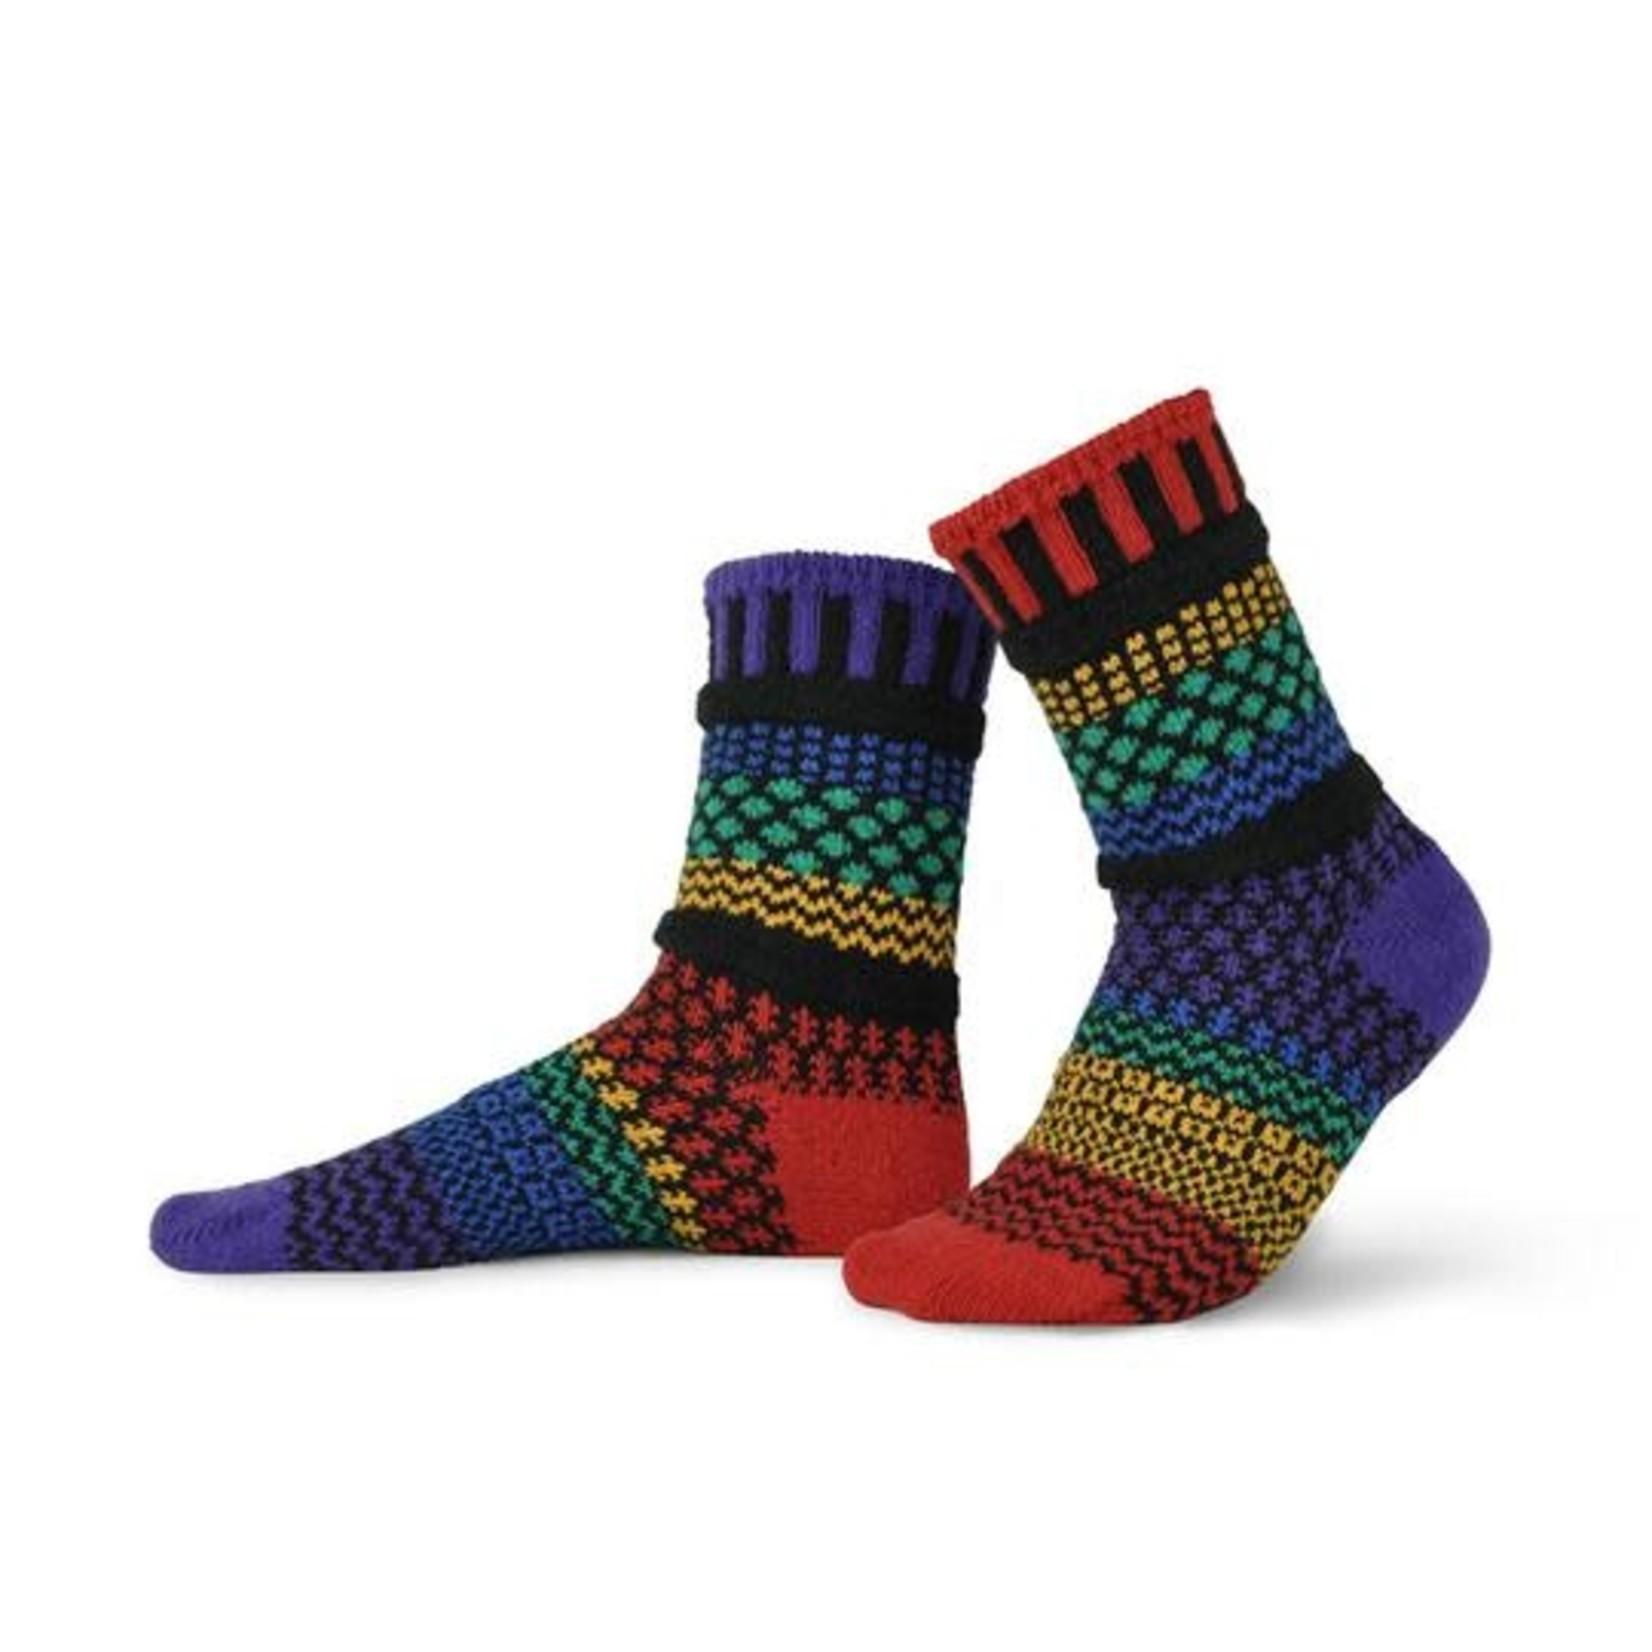 Solmates Gemstone Crew Socks